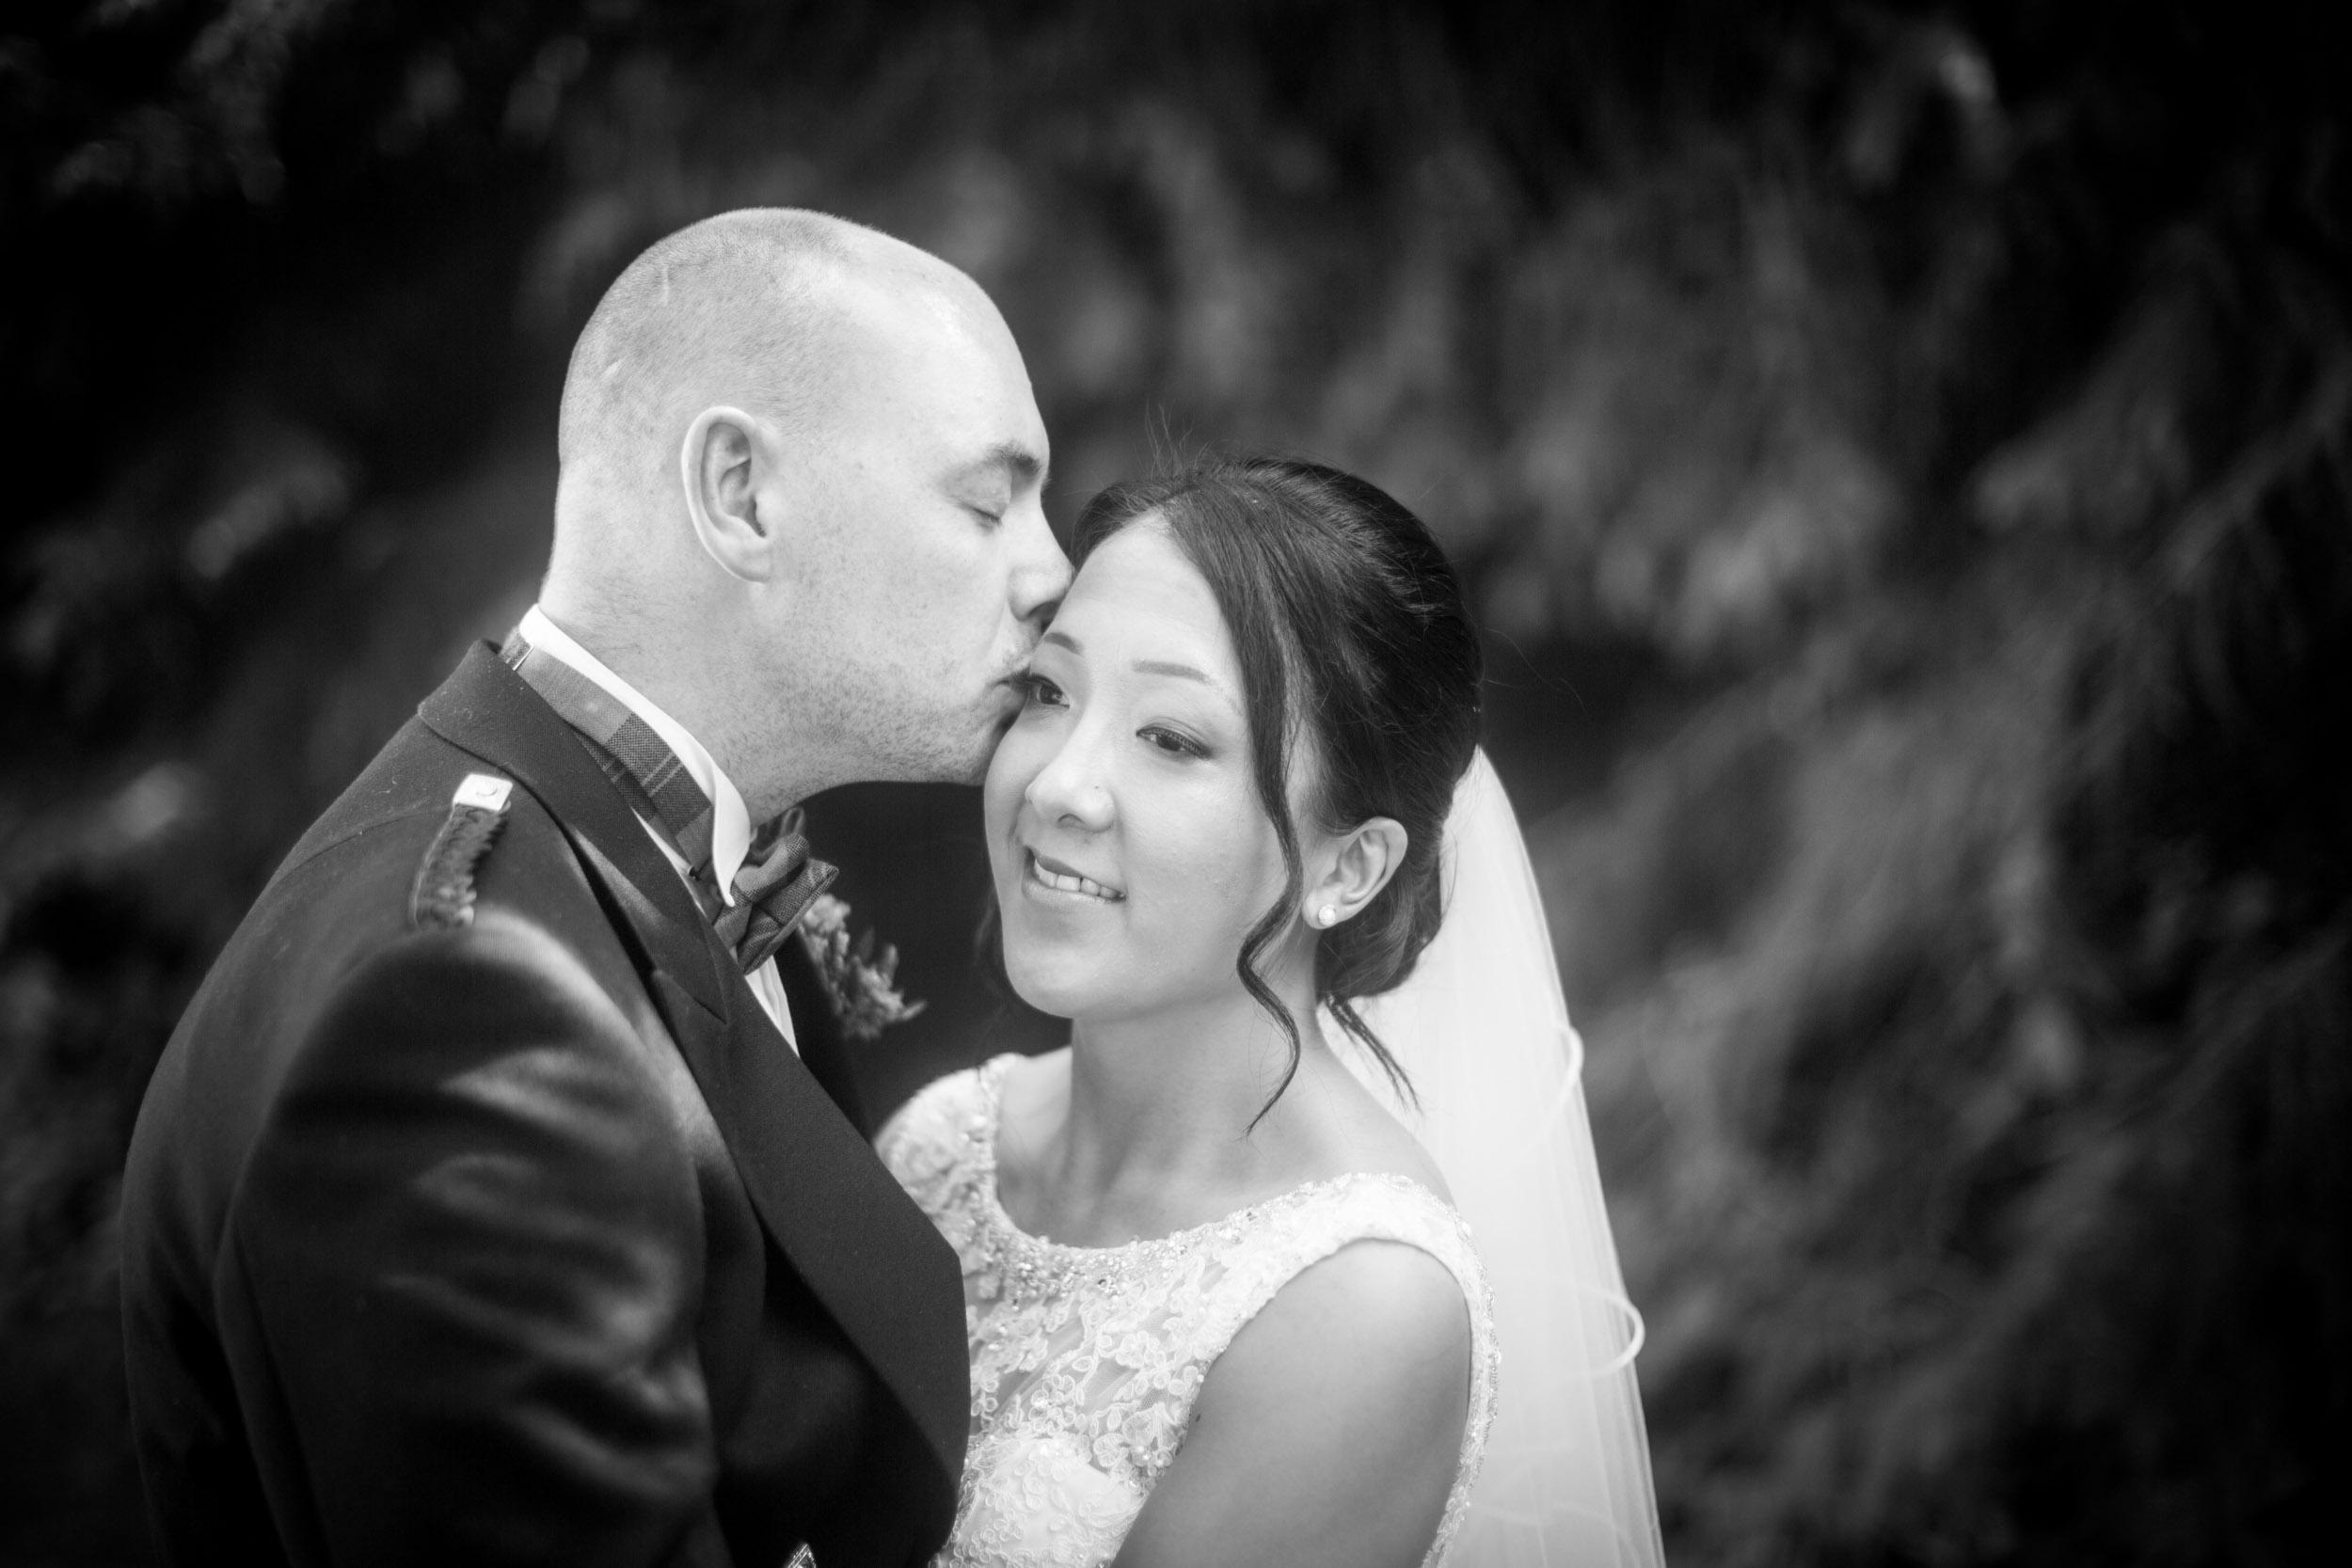 Viv and Stuart's wedding - Neil Wykes Photography-85.jpg